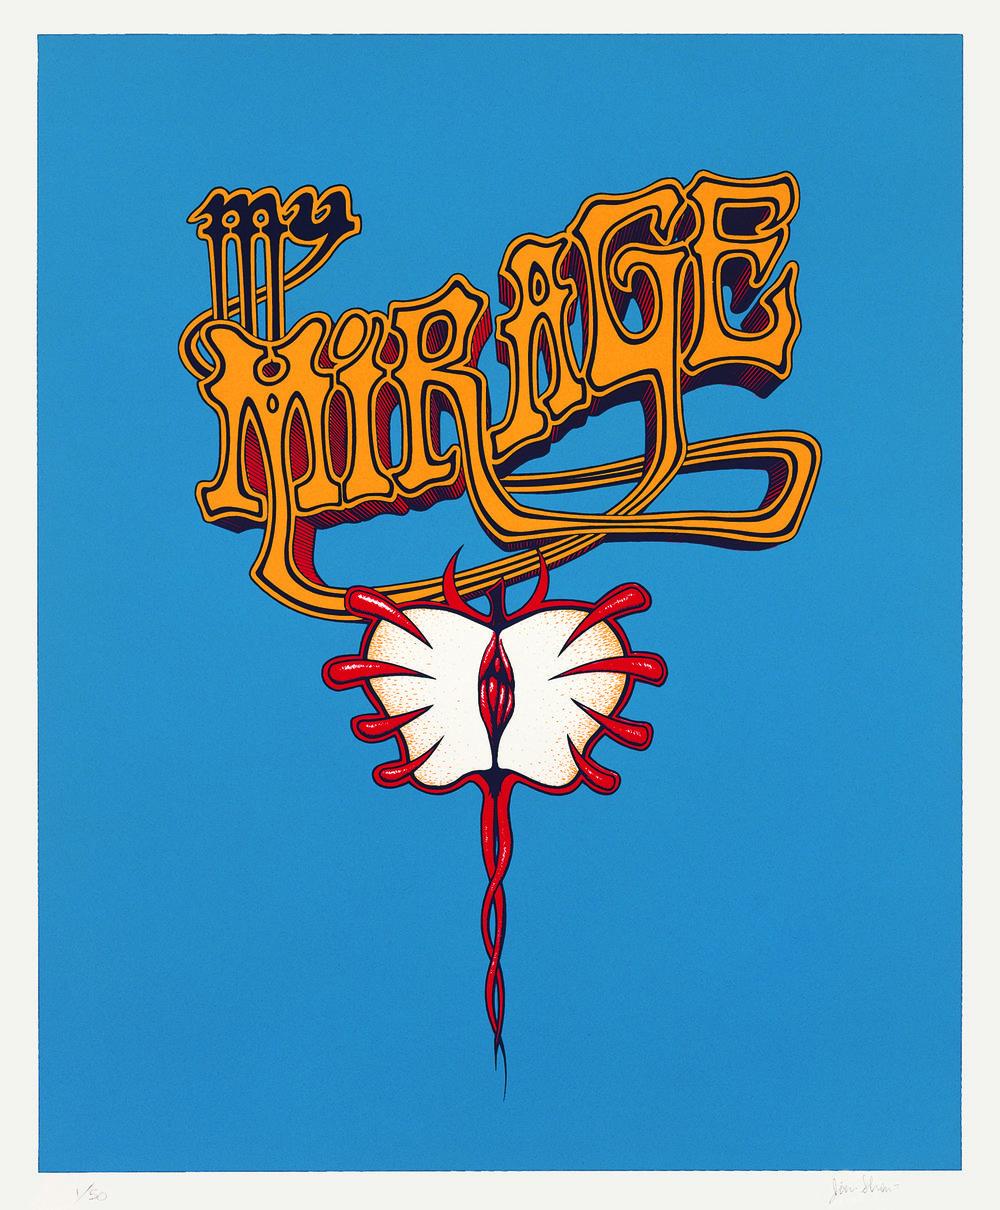 Jim Shaw, My Mirage Logo III, 1997 silkscreen print on paper. edition 55,5 x 47,5 cm - 21 7/8 x 18 3/4 inches (framed)